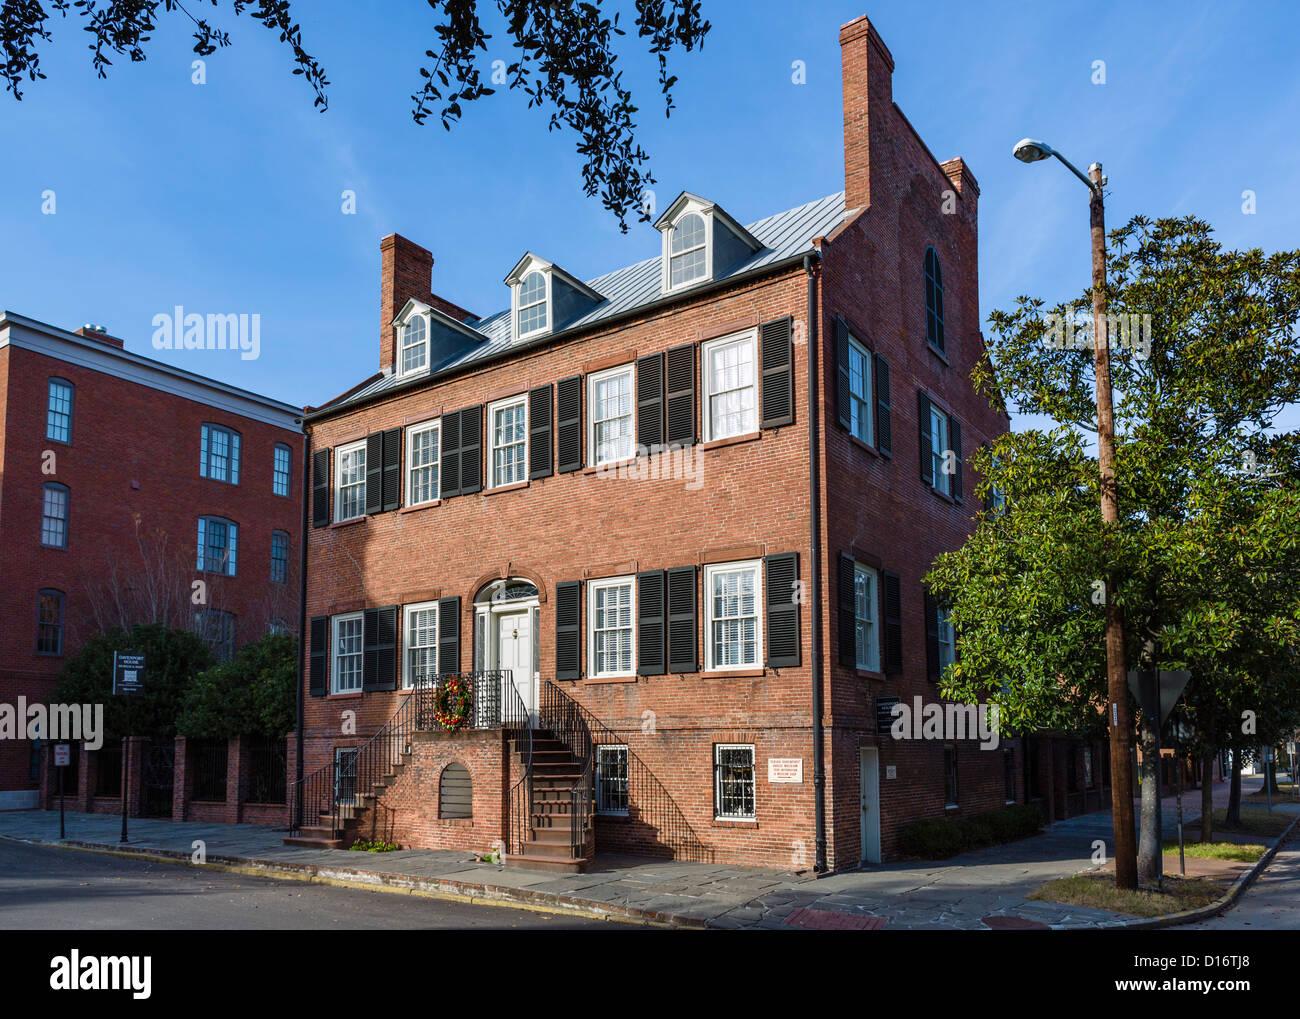 The historic Isiah Davenport House on East State Street, Columbia Square, Savannah, Georgia, USA - Stock Image